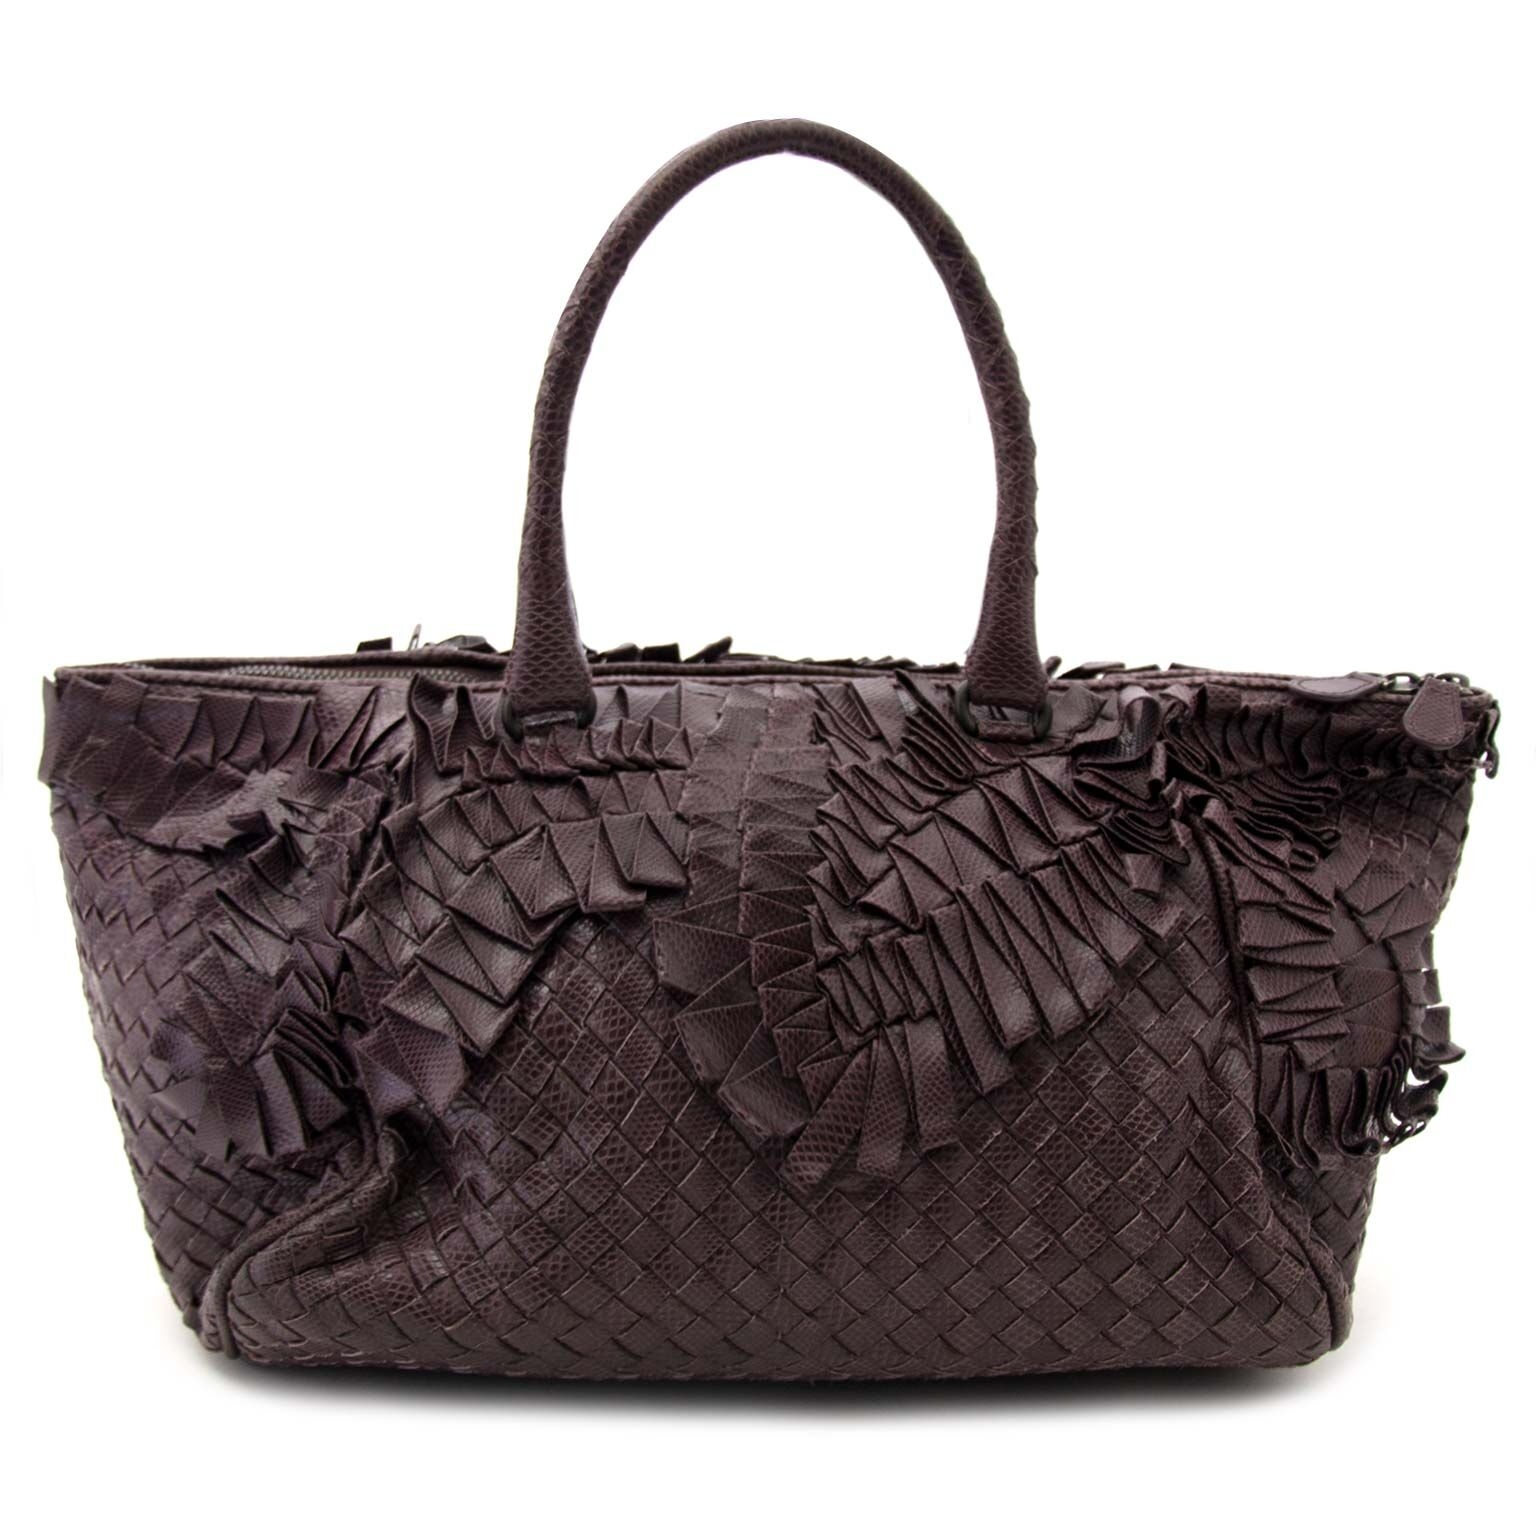 6305a85f6290 Labellov Buy authentic vintagePrada designer bags, shoes, clothes ...